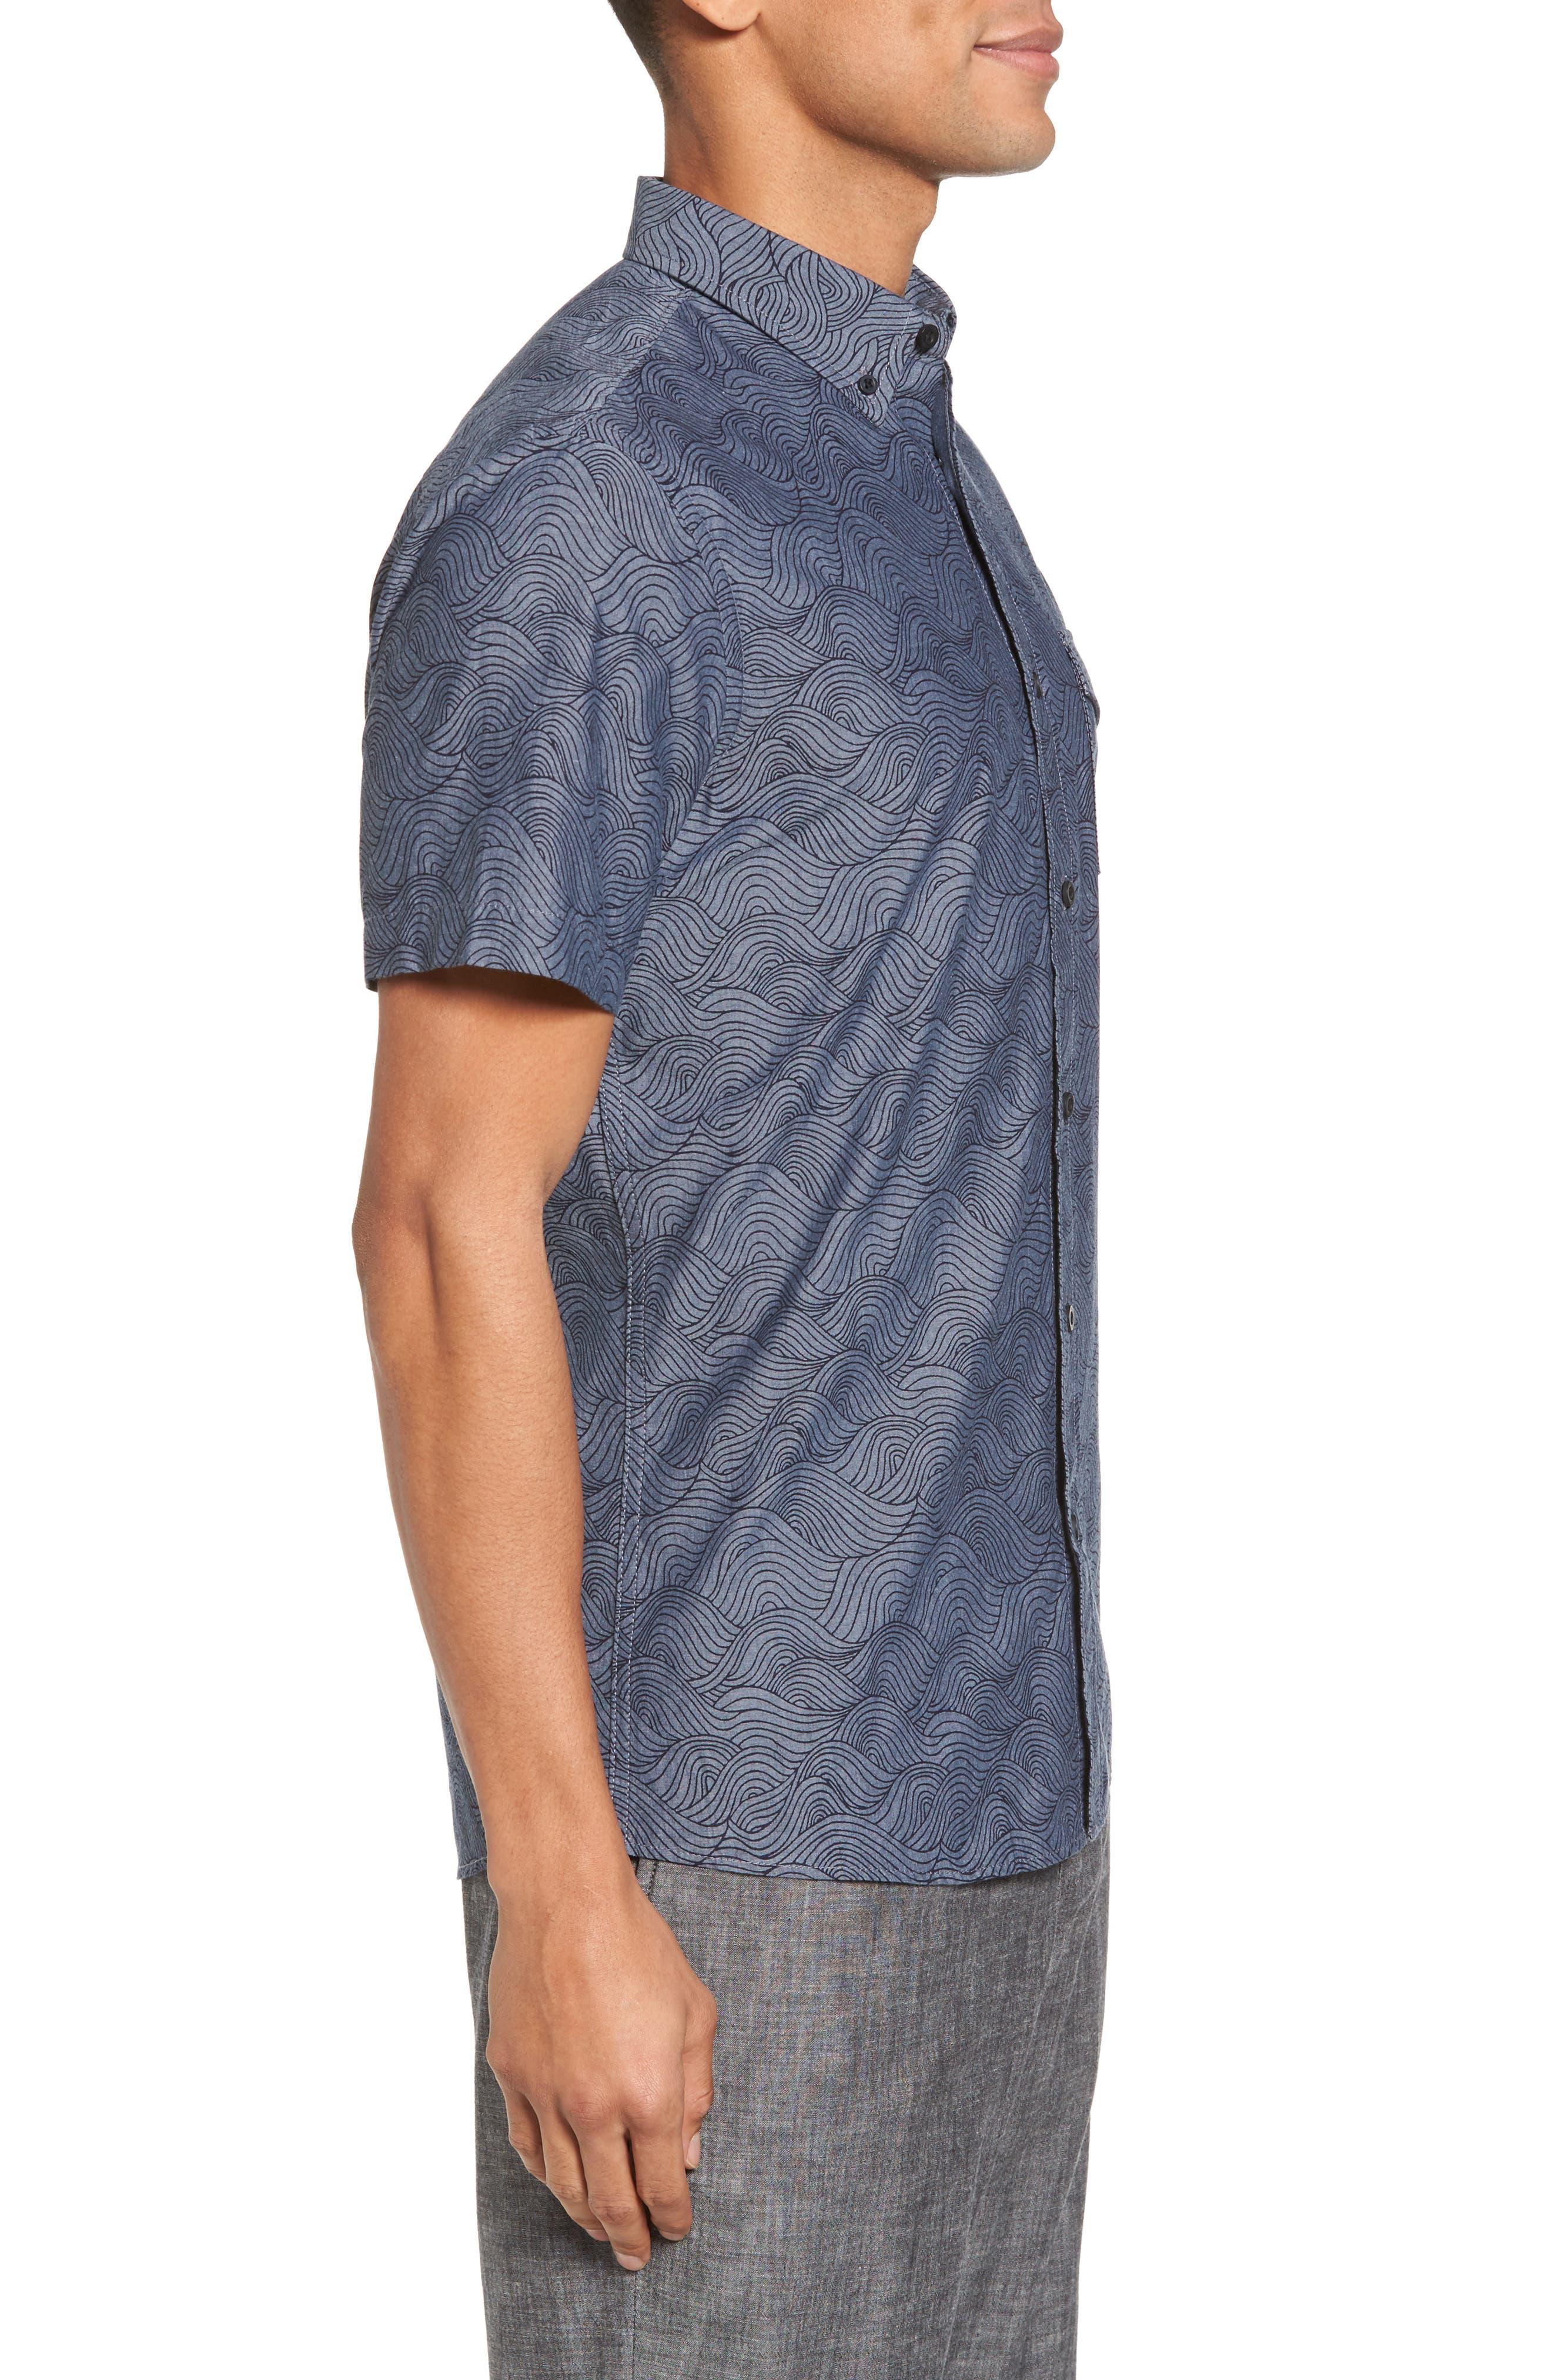 Trim Fit Ivy Print Sport Shirt,                             Alternate thumbnail 3, color,                             Grey Onyx Rolling Waves